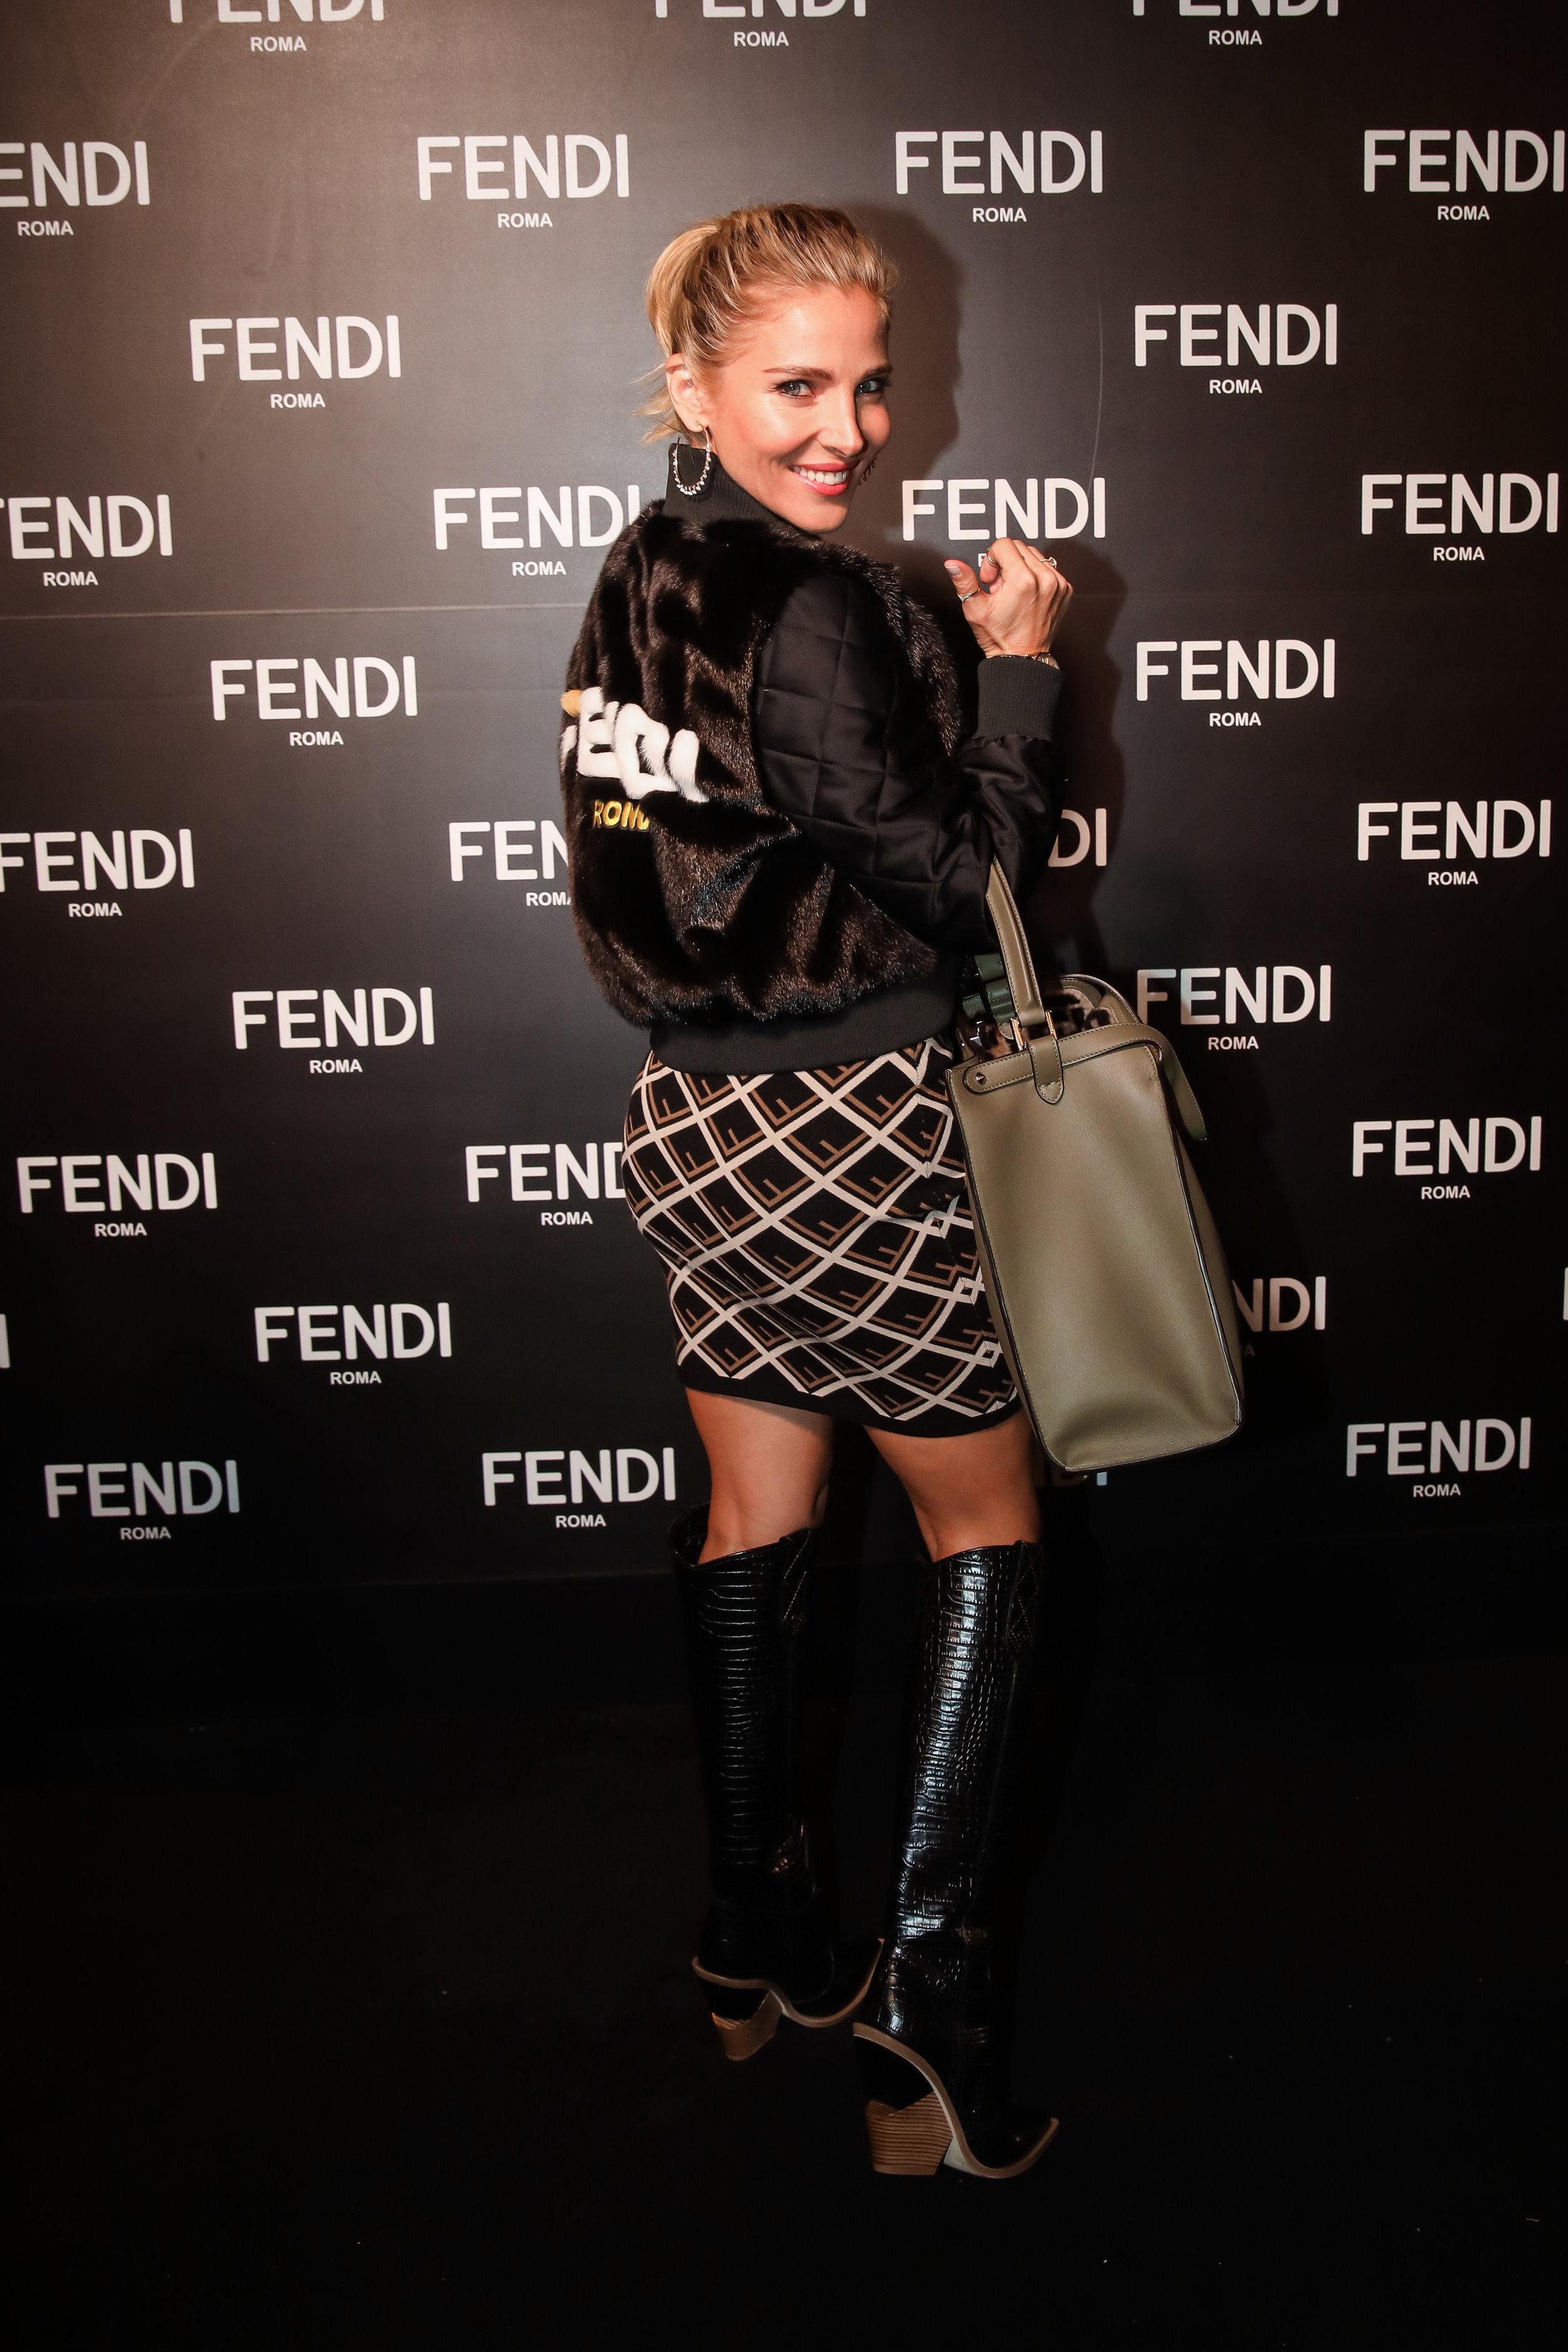 Elsa Pataky Fendi Collins Street Launch 30.8.18-3633.jpg